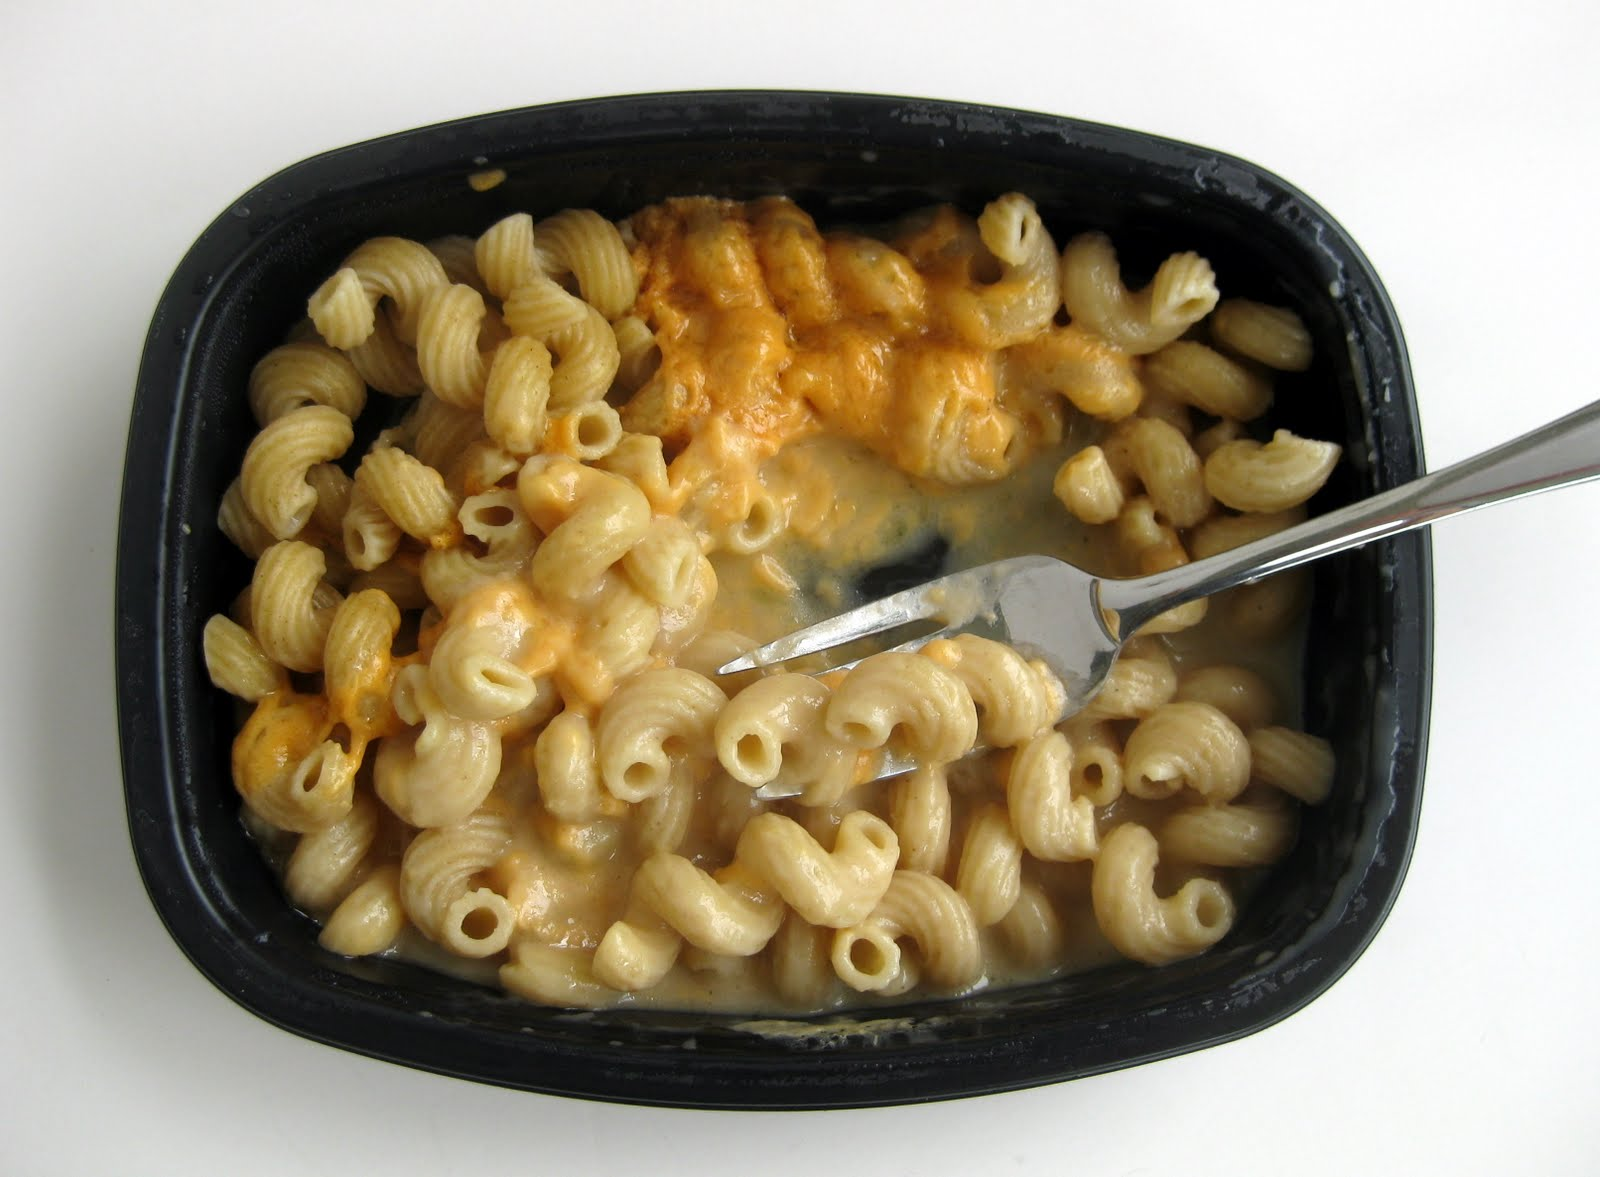 Whole Foods Vegan Macaroni And Cheese Recipe